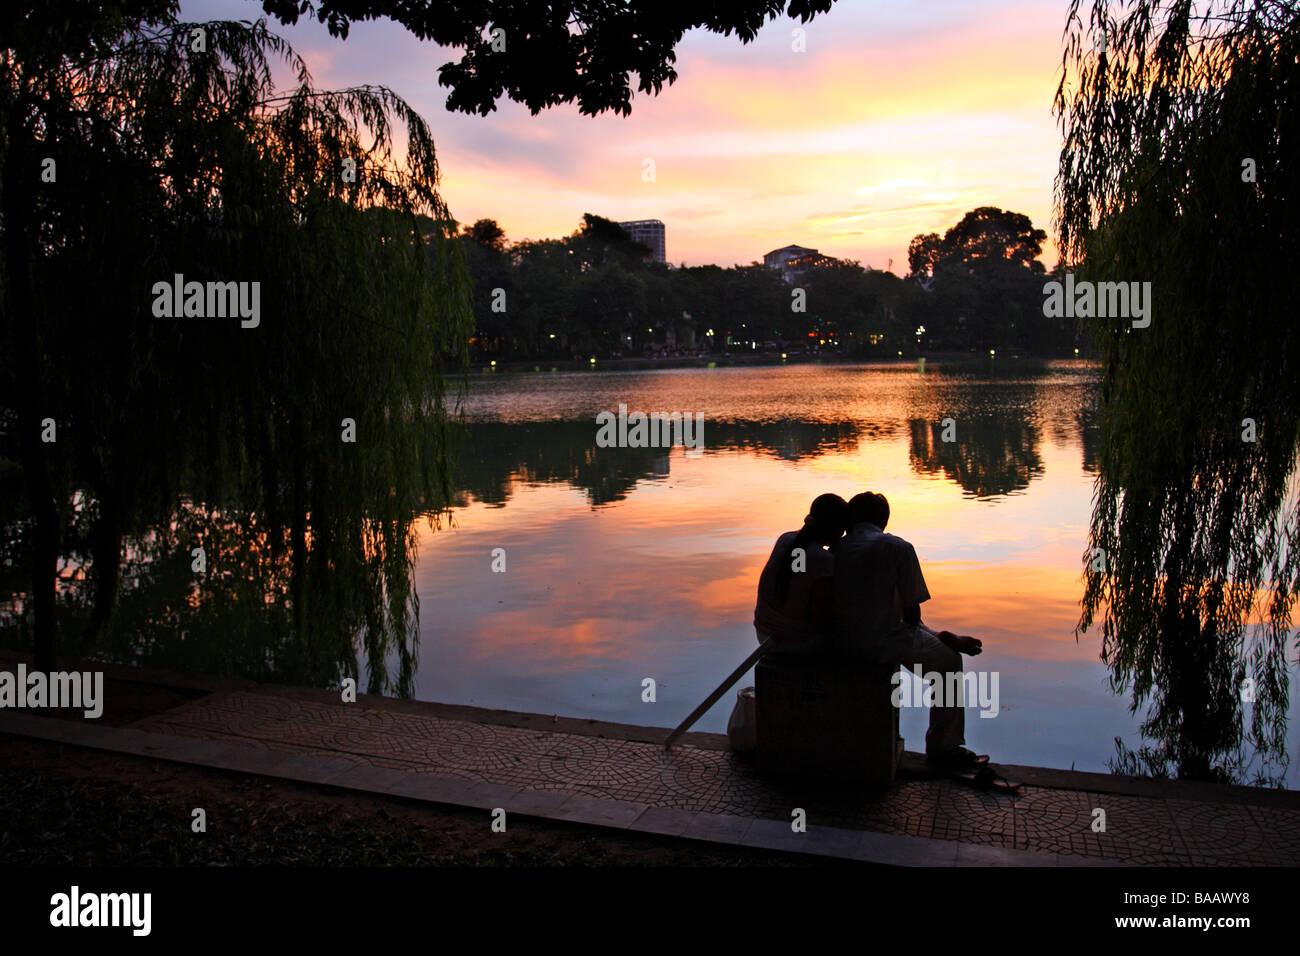 Street scene. Couple sitting in front of a beautiful sunset on Hoan Kiem lake. Hanoi, Vietnam - Stock Image